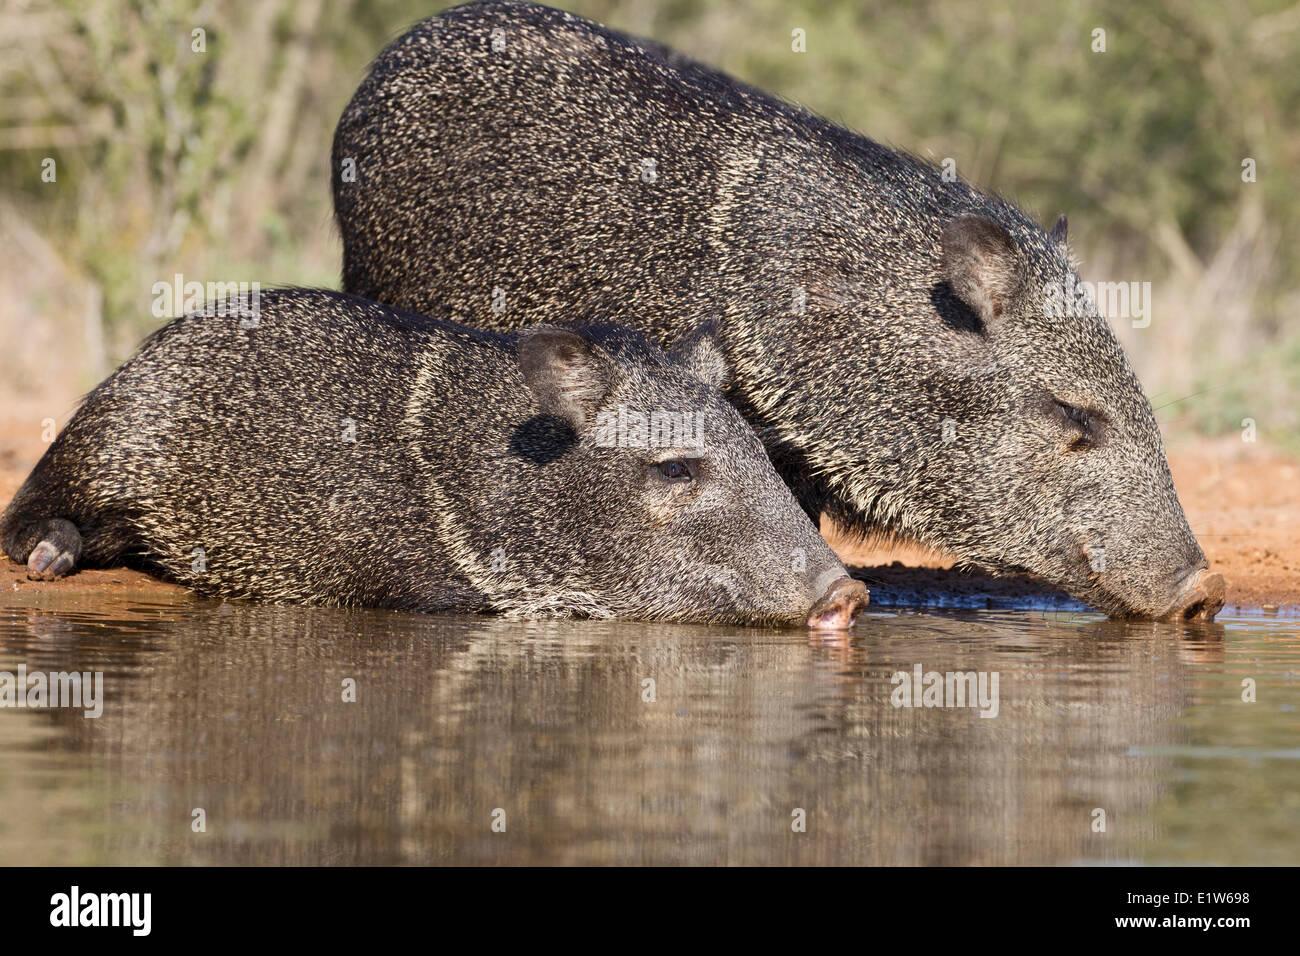 Collared peccary (Pecari tajacu), drinking/lying in pond to keep cool, Santa Clara Ranch, near Edinburg, South Texas. - Stock Image